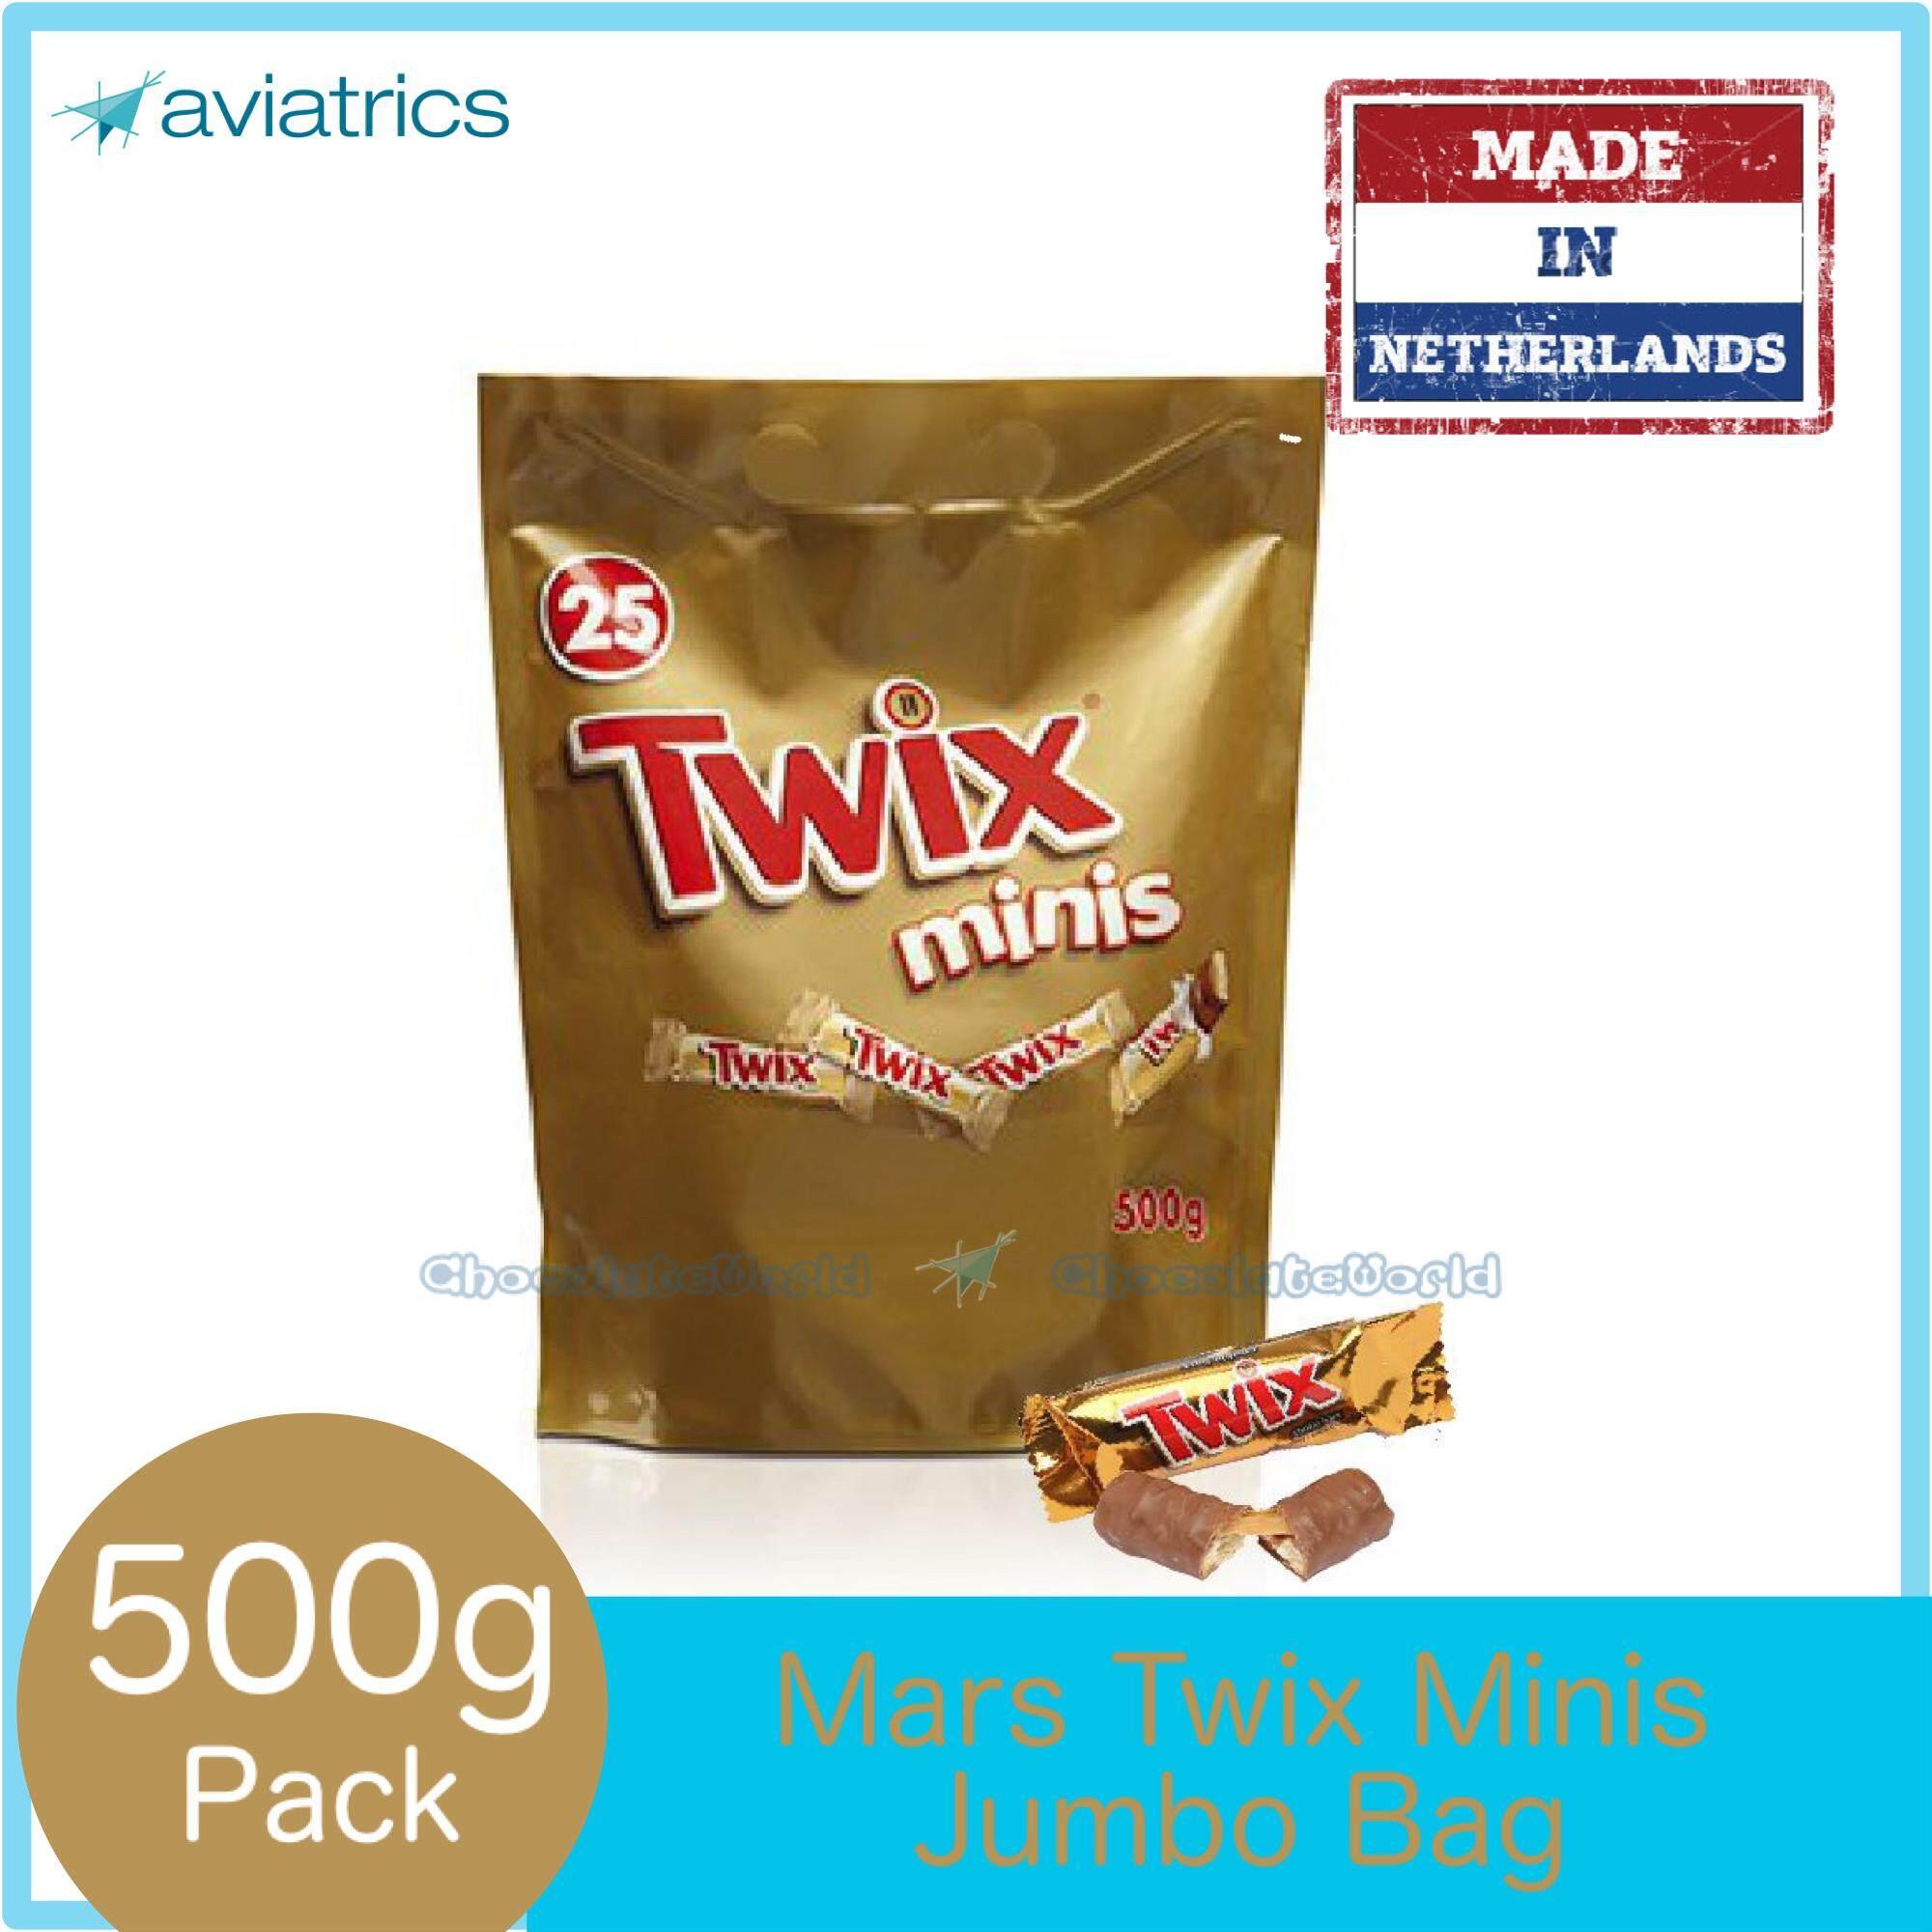 Twix Minis Jumbo bag 500g (Made in Netherlands)